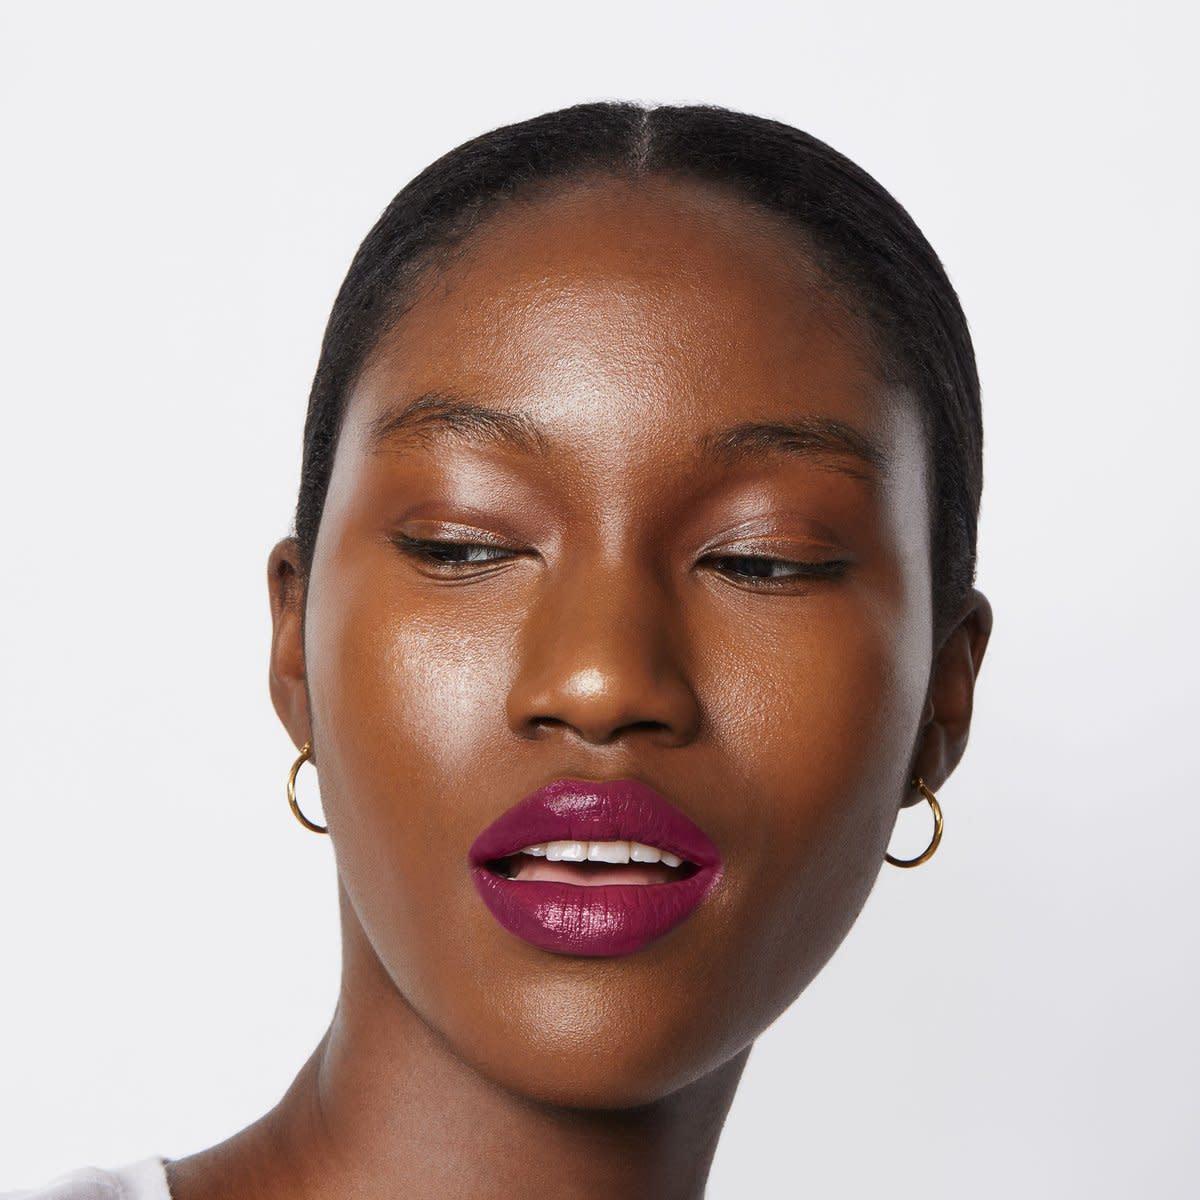 uoma-badass-icon-lipstick-promo